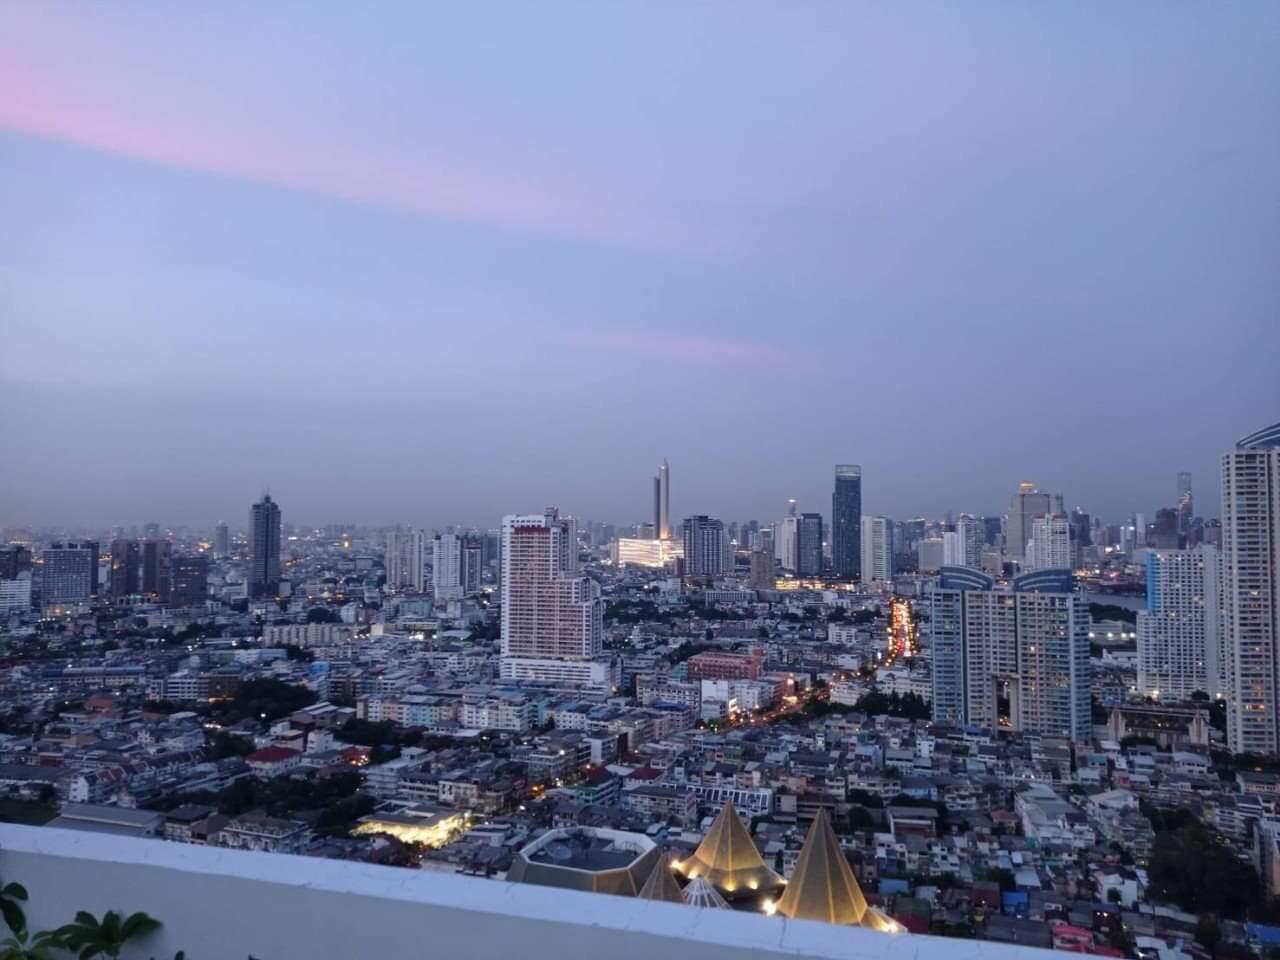 SUPALAI RIVER RESORT – BTS Krung Thonburi – Unit 73.5 Sq.m